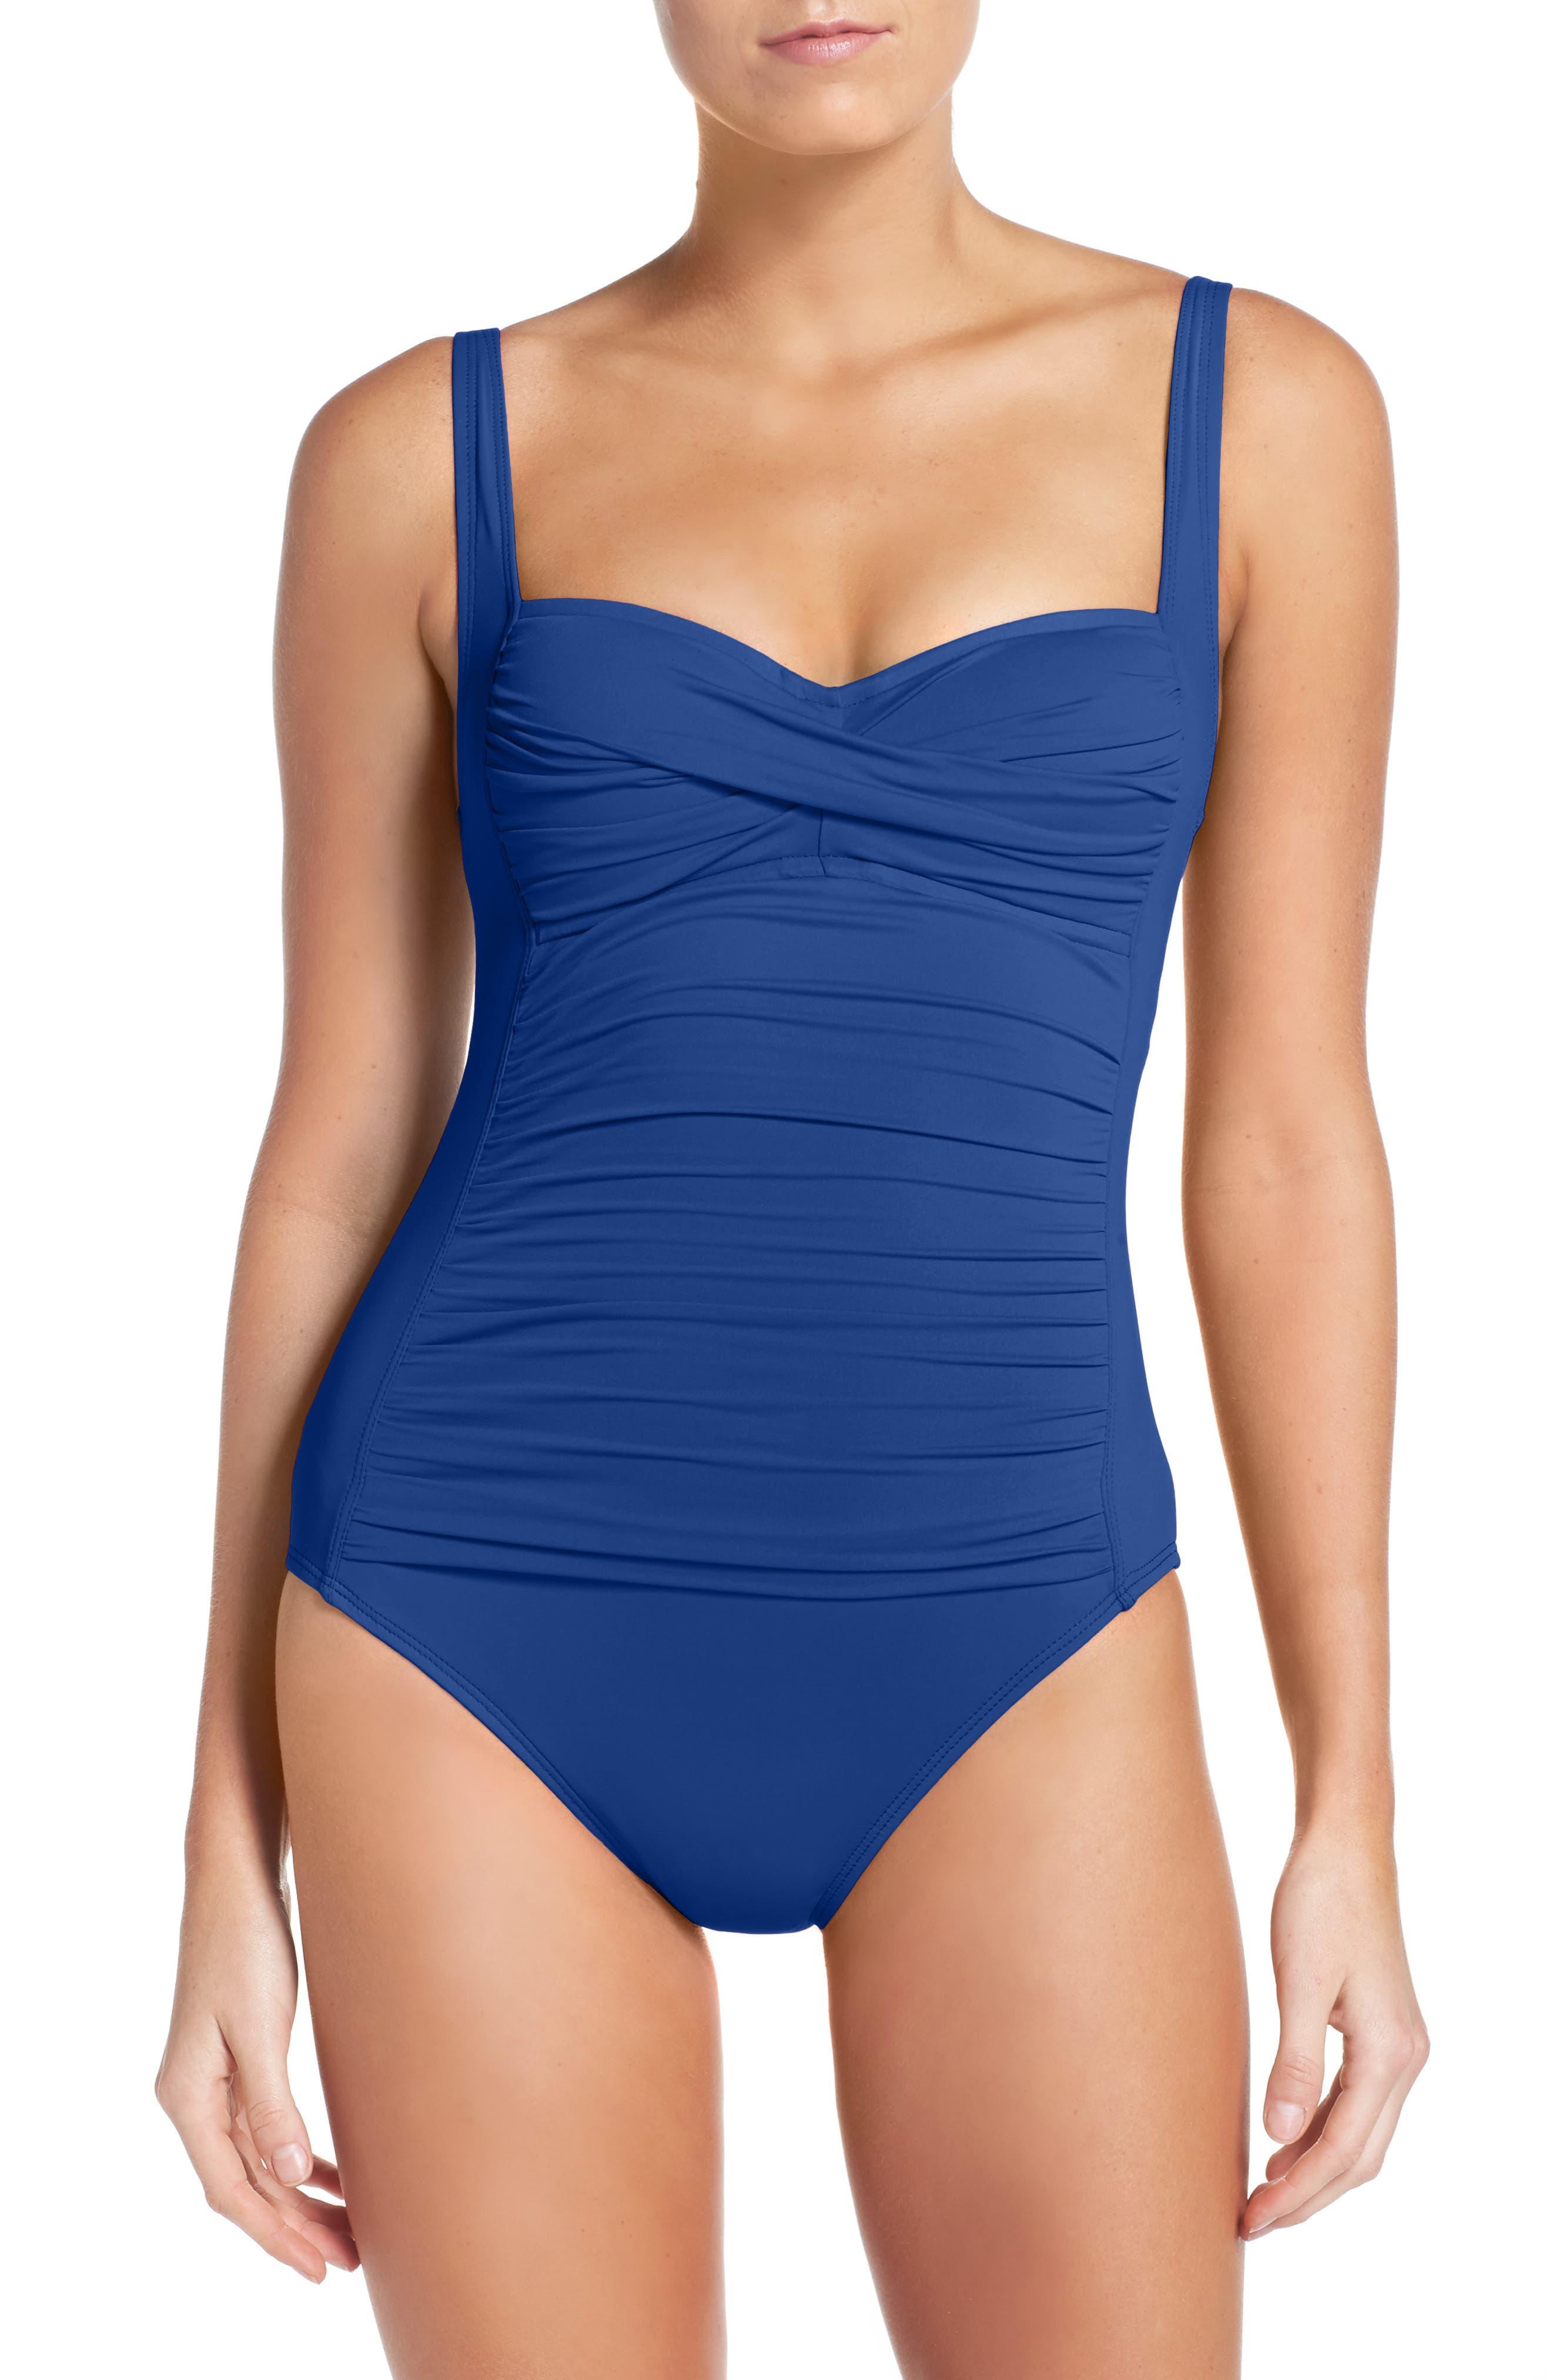 Main Image - La Blanca 'Sweetheart' One-Piece Swimsuit